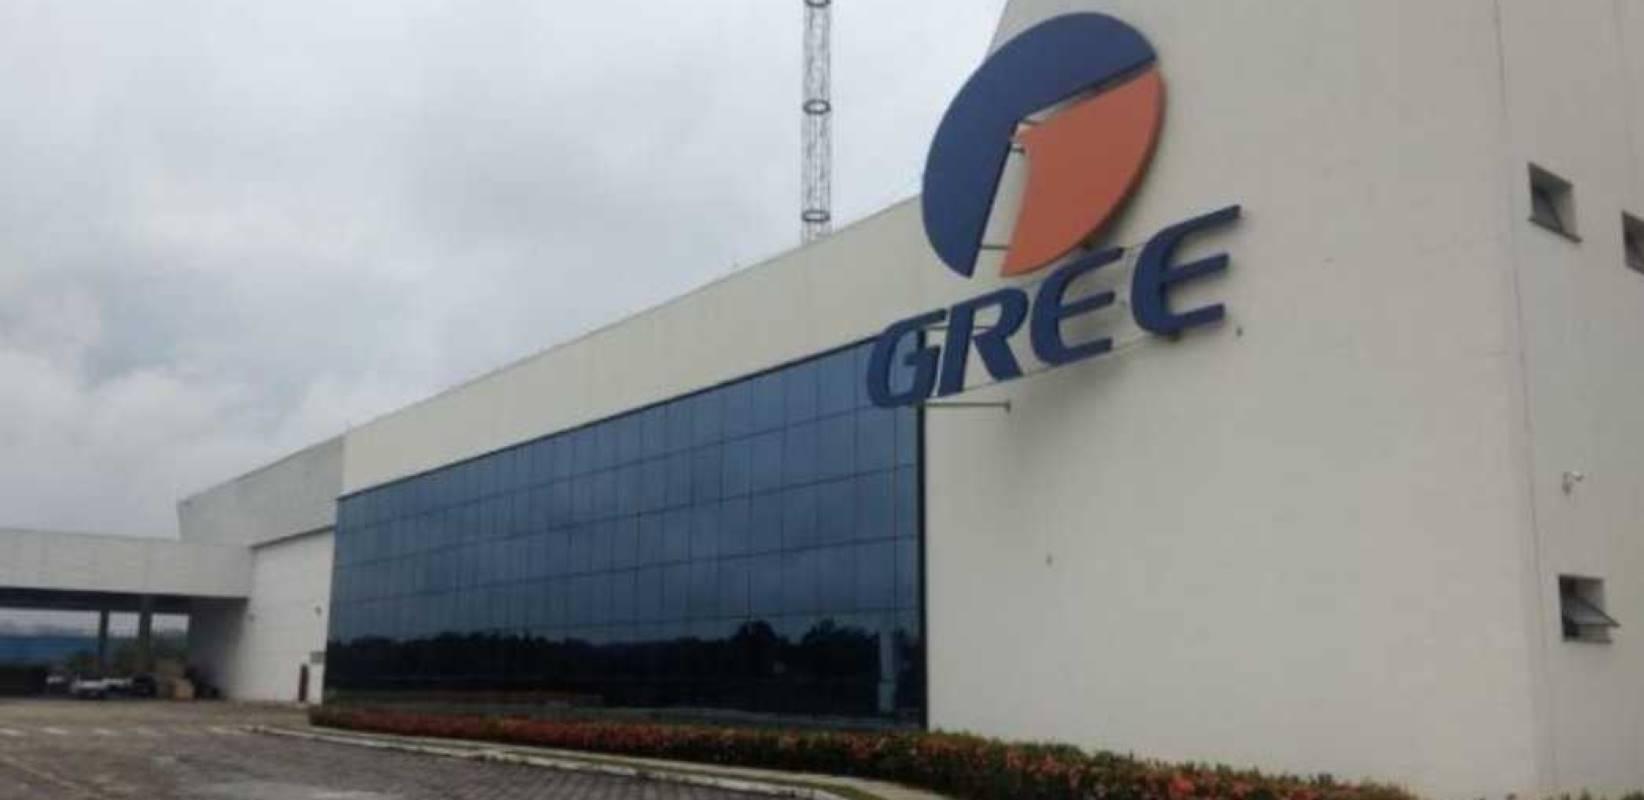 GREE DO BRASIL vaga de empregos - GREE DO BRASIL vaga de emprego